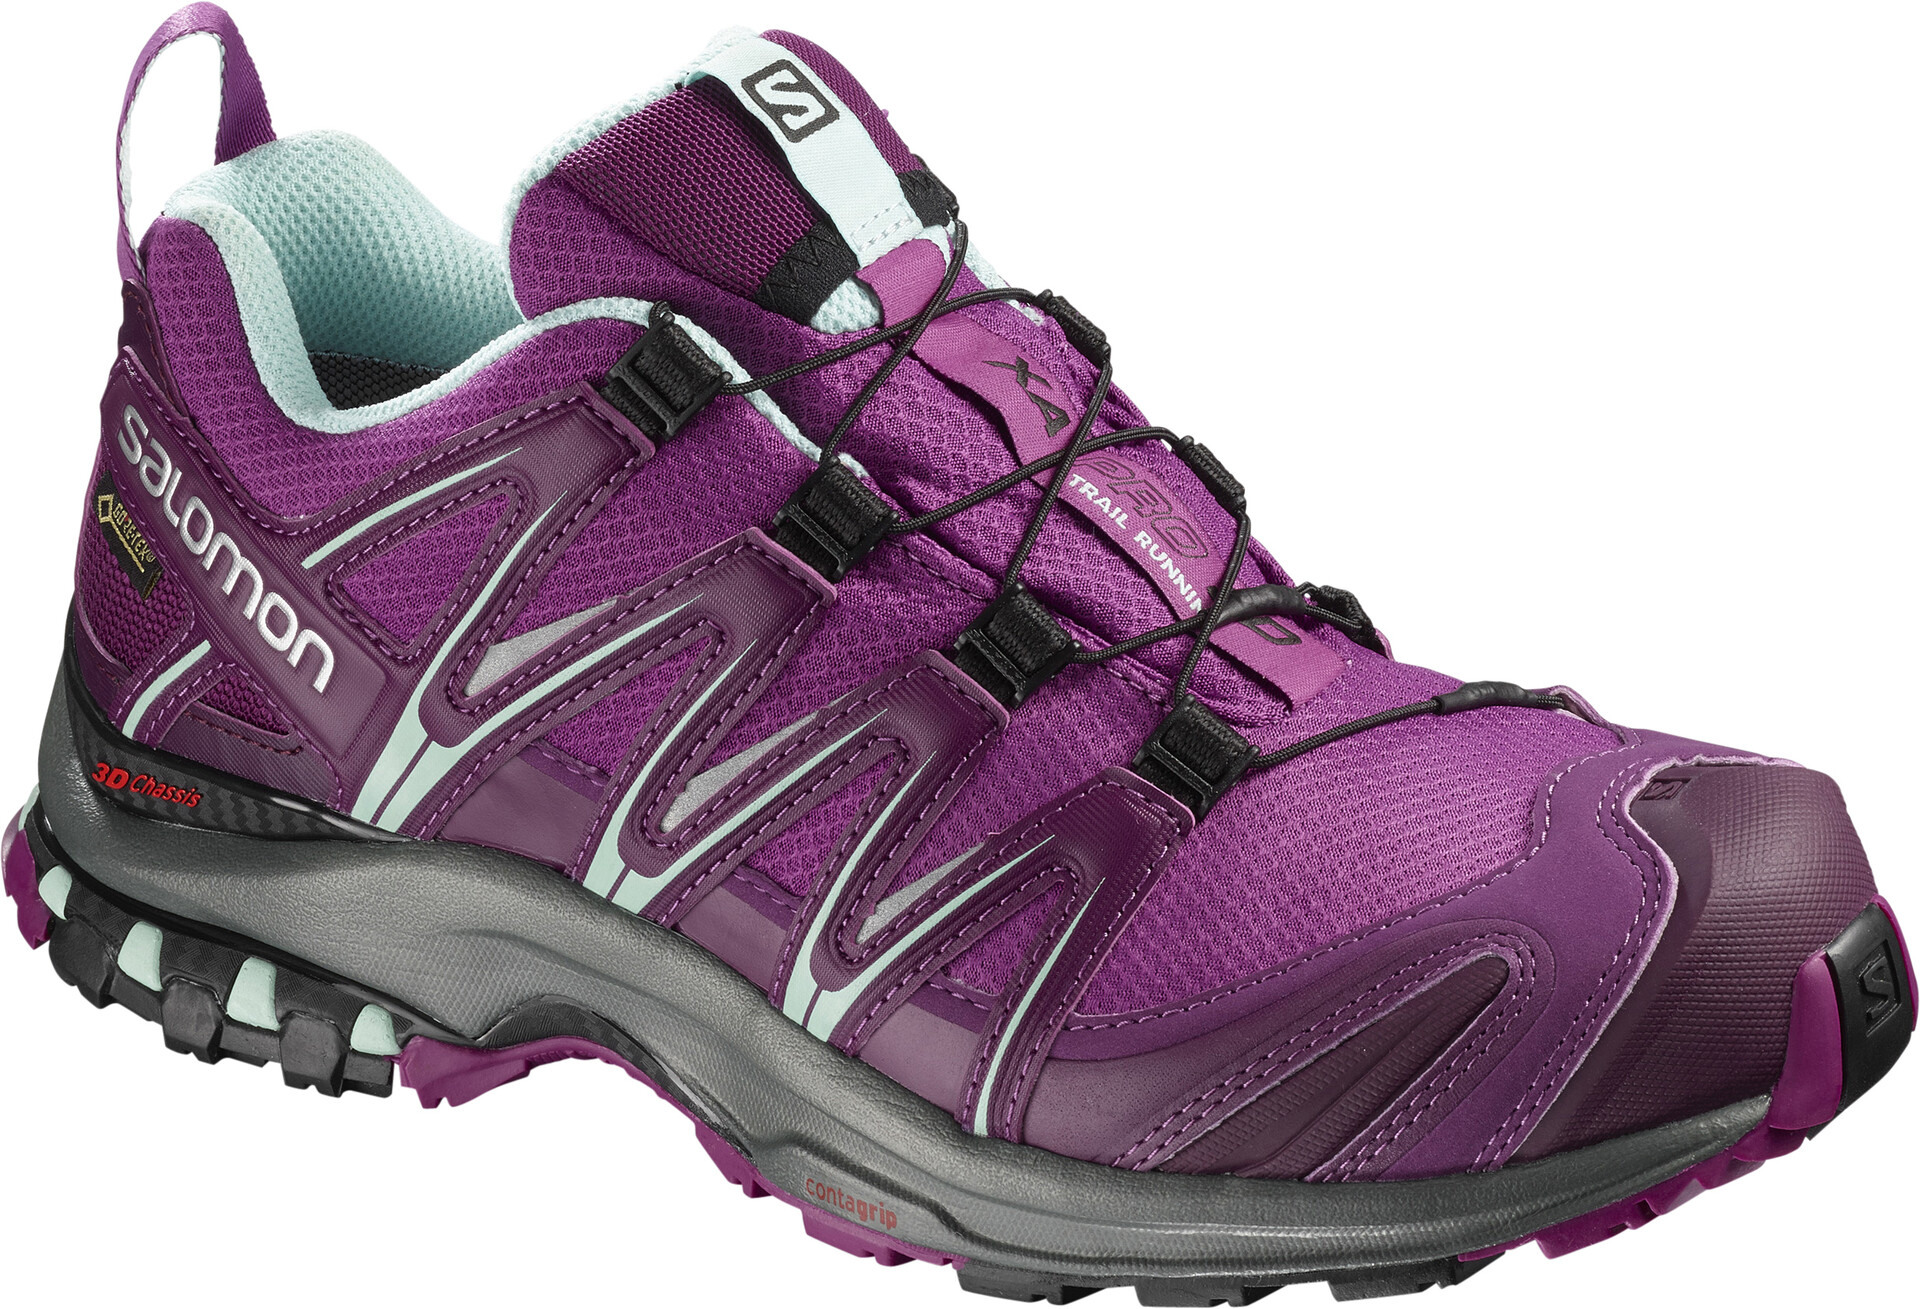 Salomon XA Pro 3D GTX Chaussures running Femme, hollyhockdark purpleeggshell blue